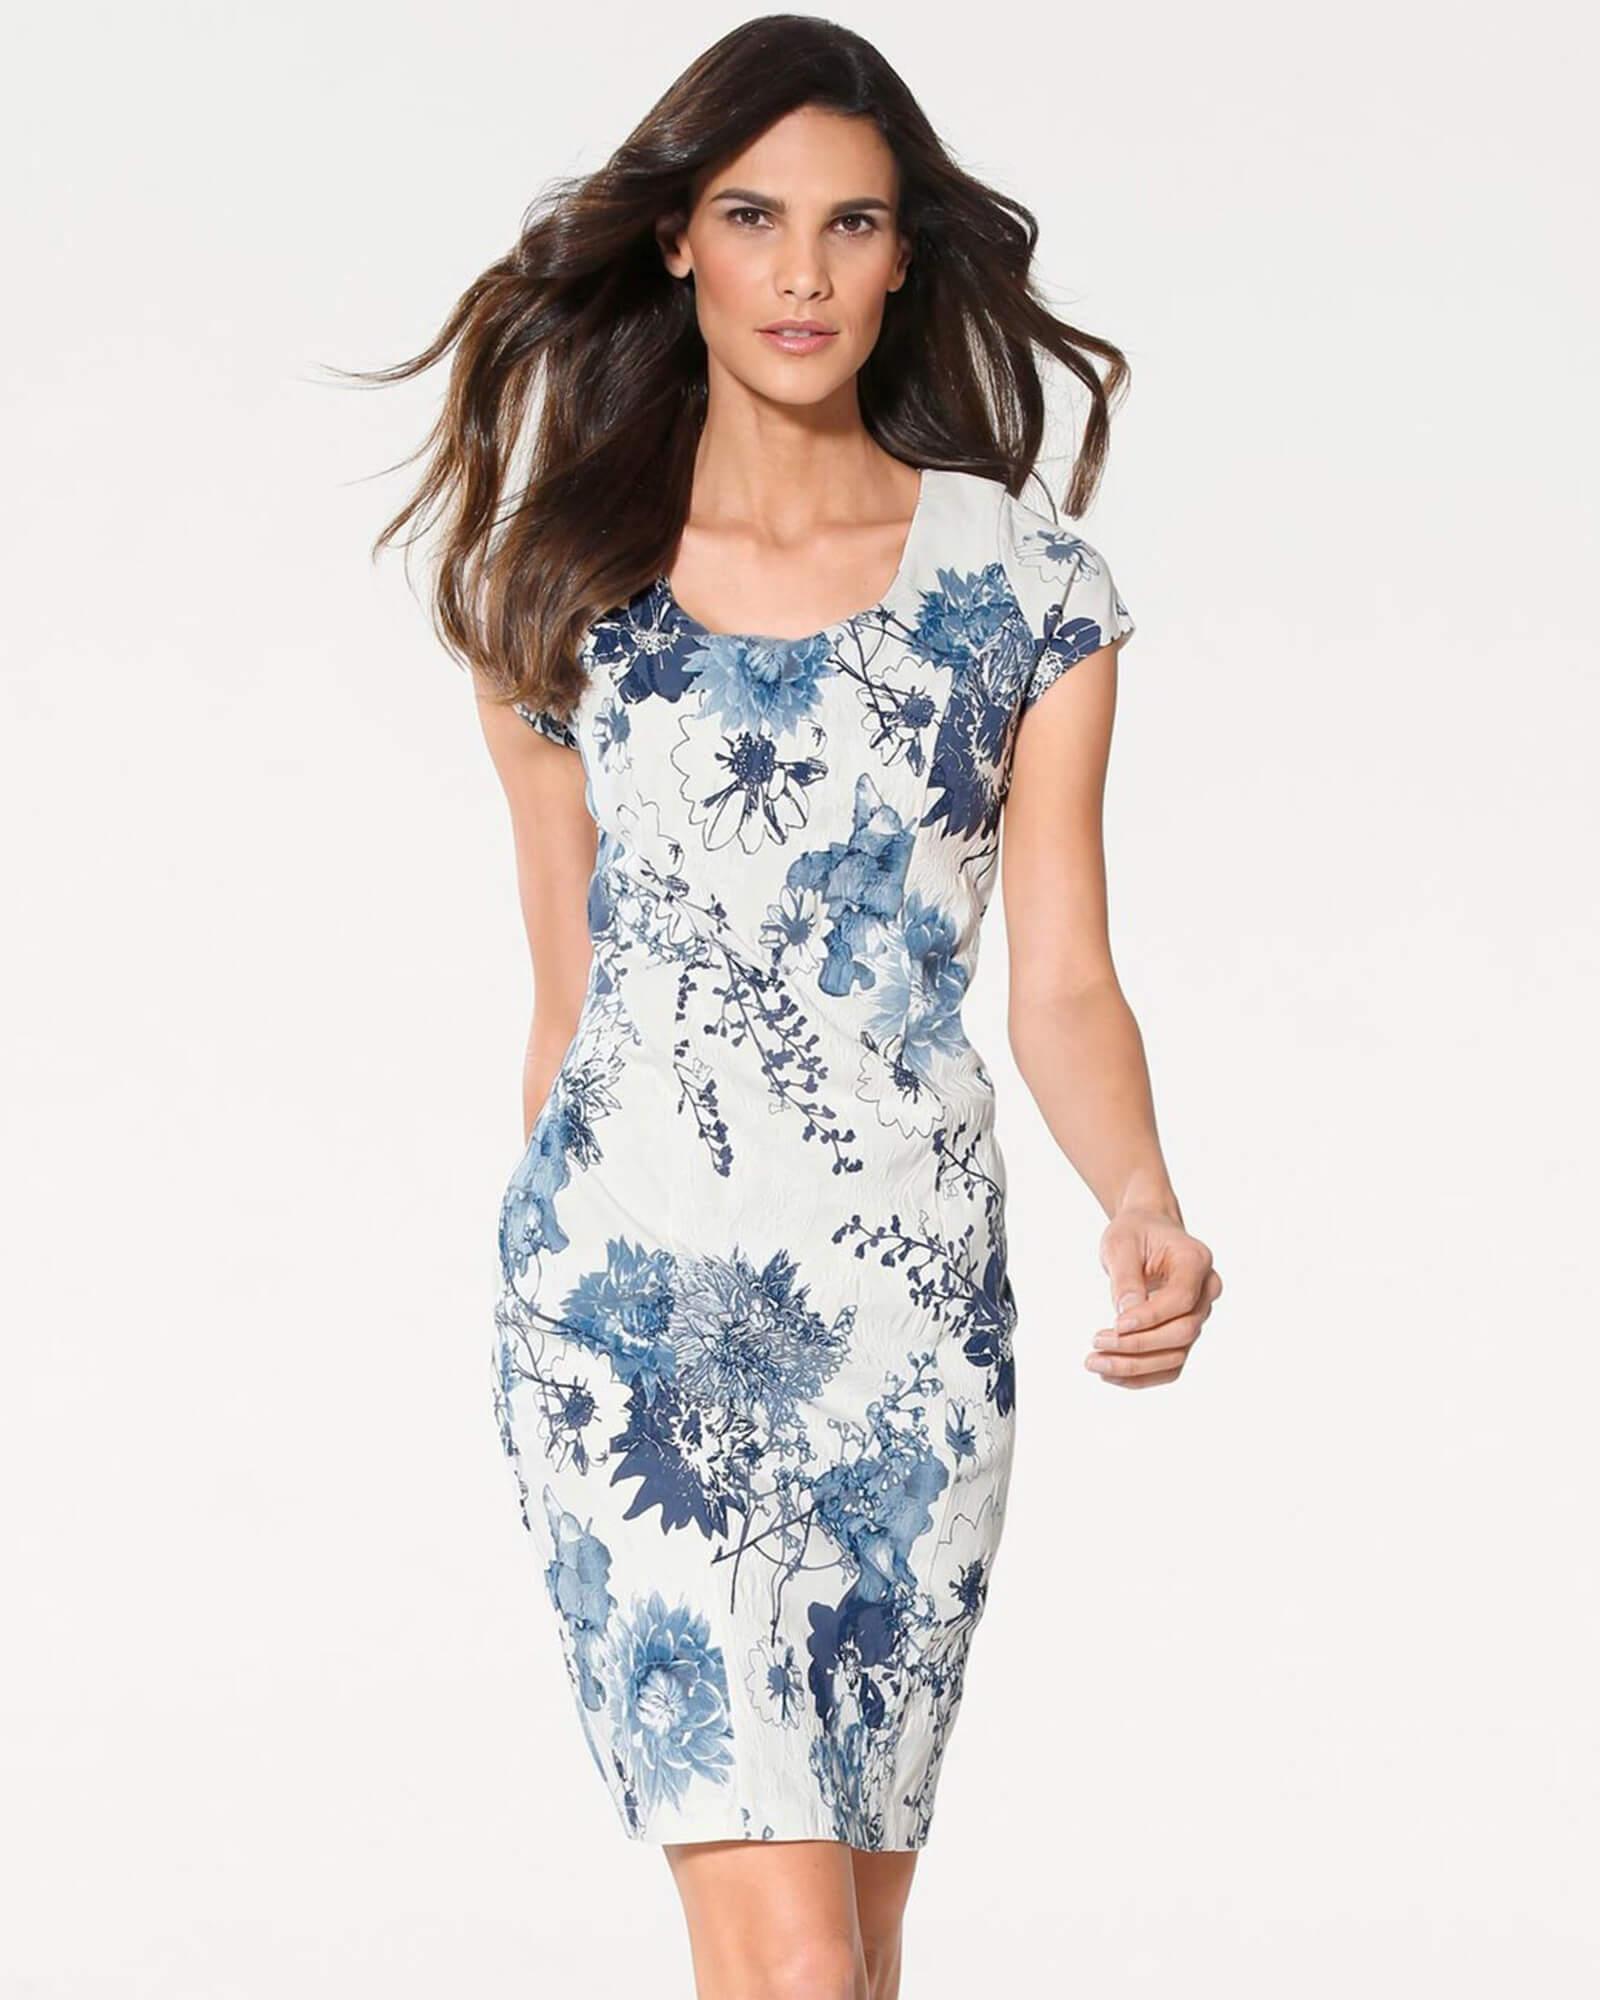 Etuikleid blau-weiß mit floralem Muster